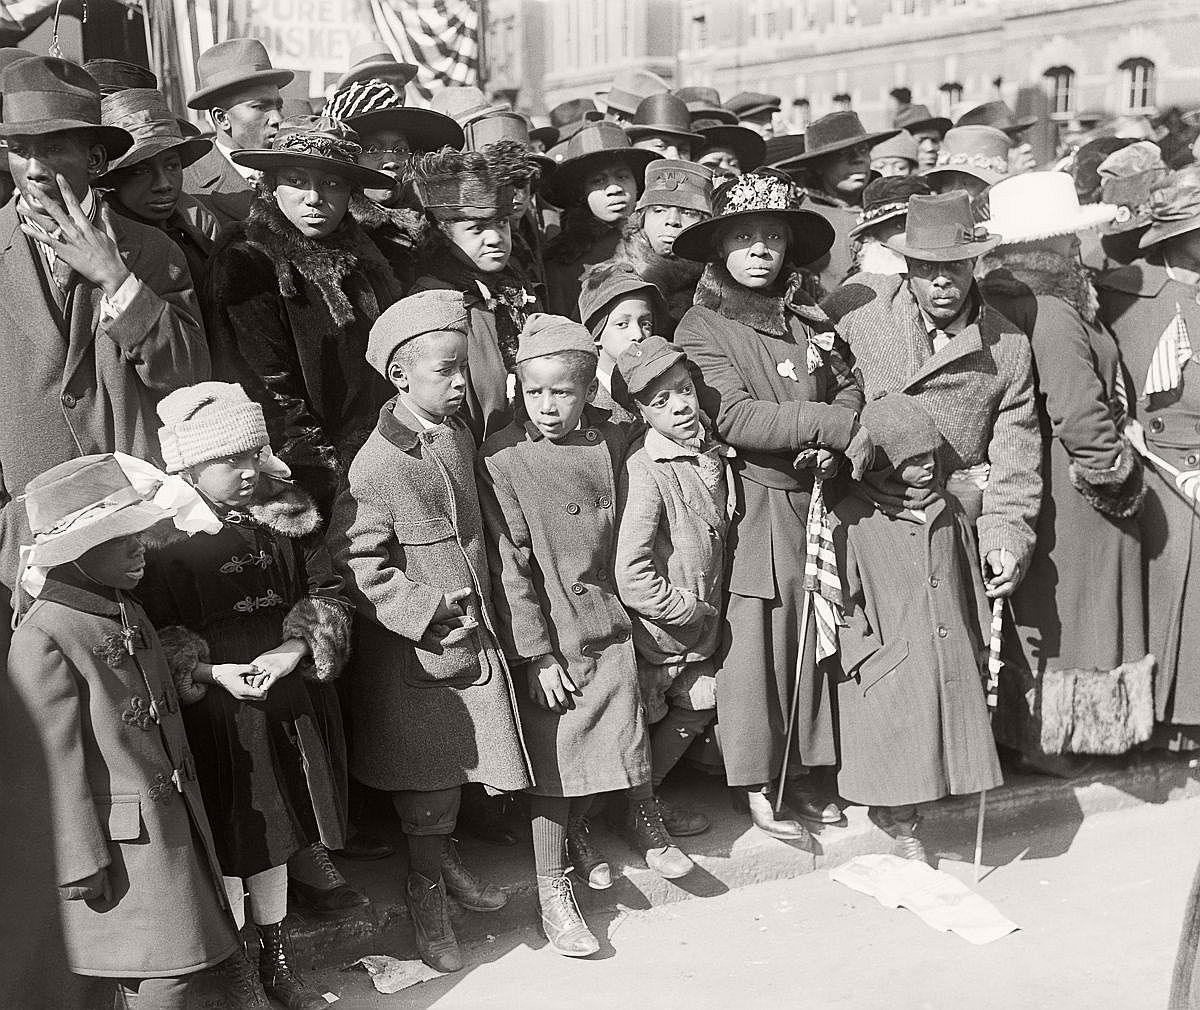 Spectators gather to watch the 369th on their return parade. Feb. 17, 1919. (Bettmann/Corbis)